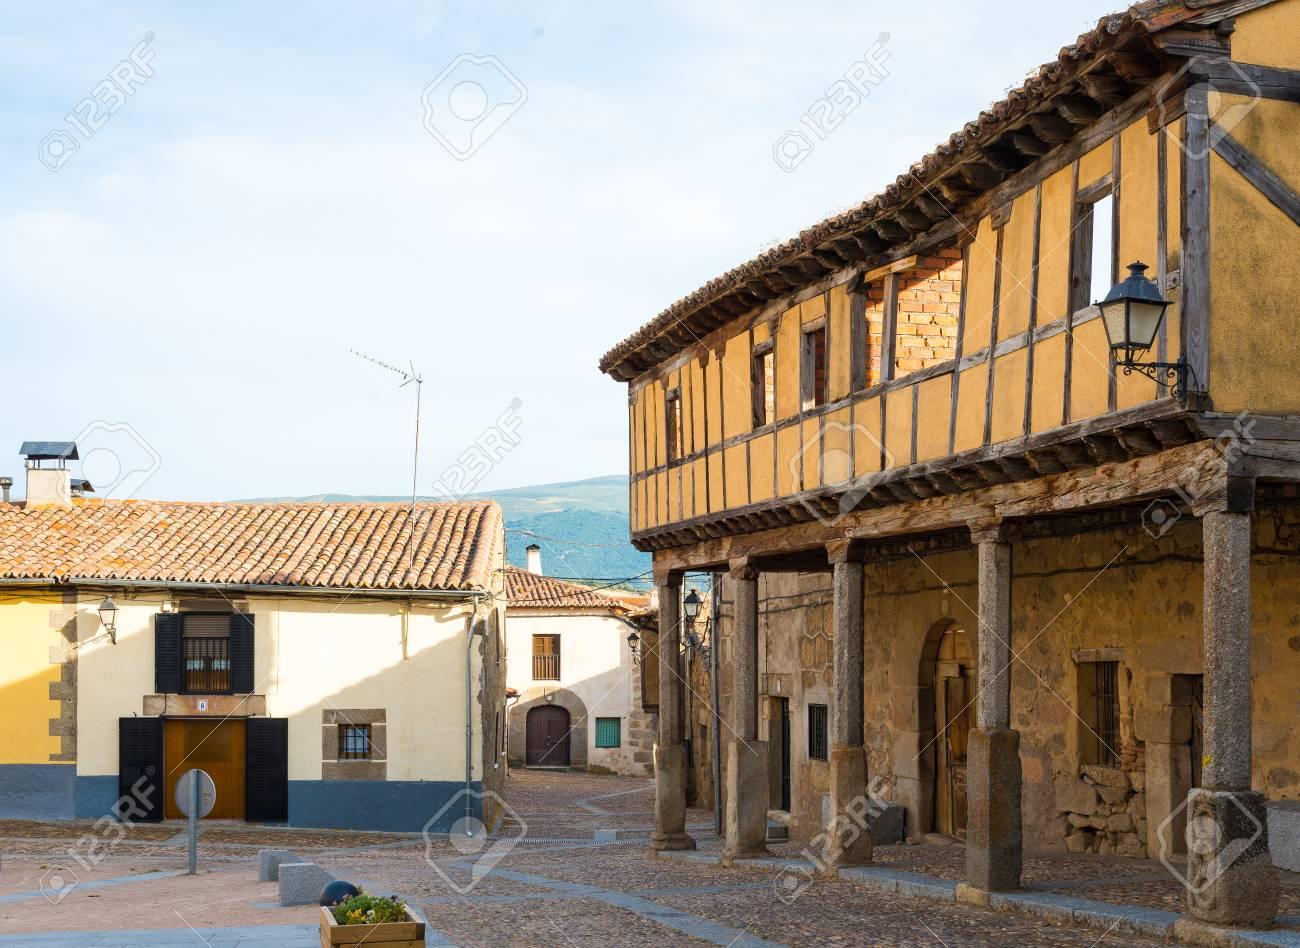 Street Of Bonilla De La Sierra Castilla Y Leon Spain